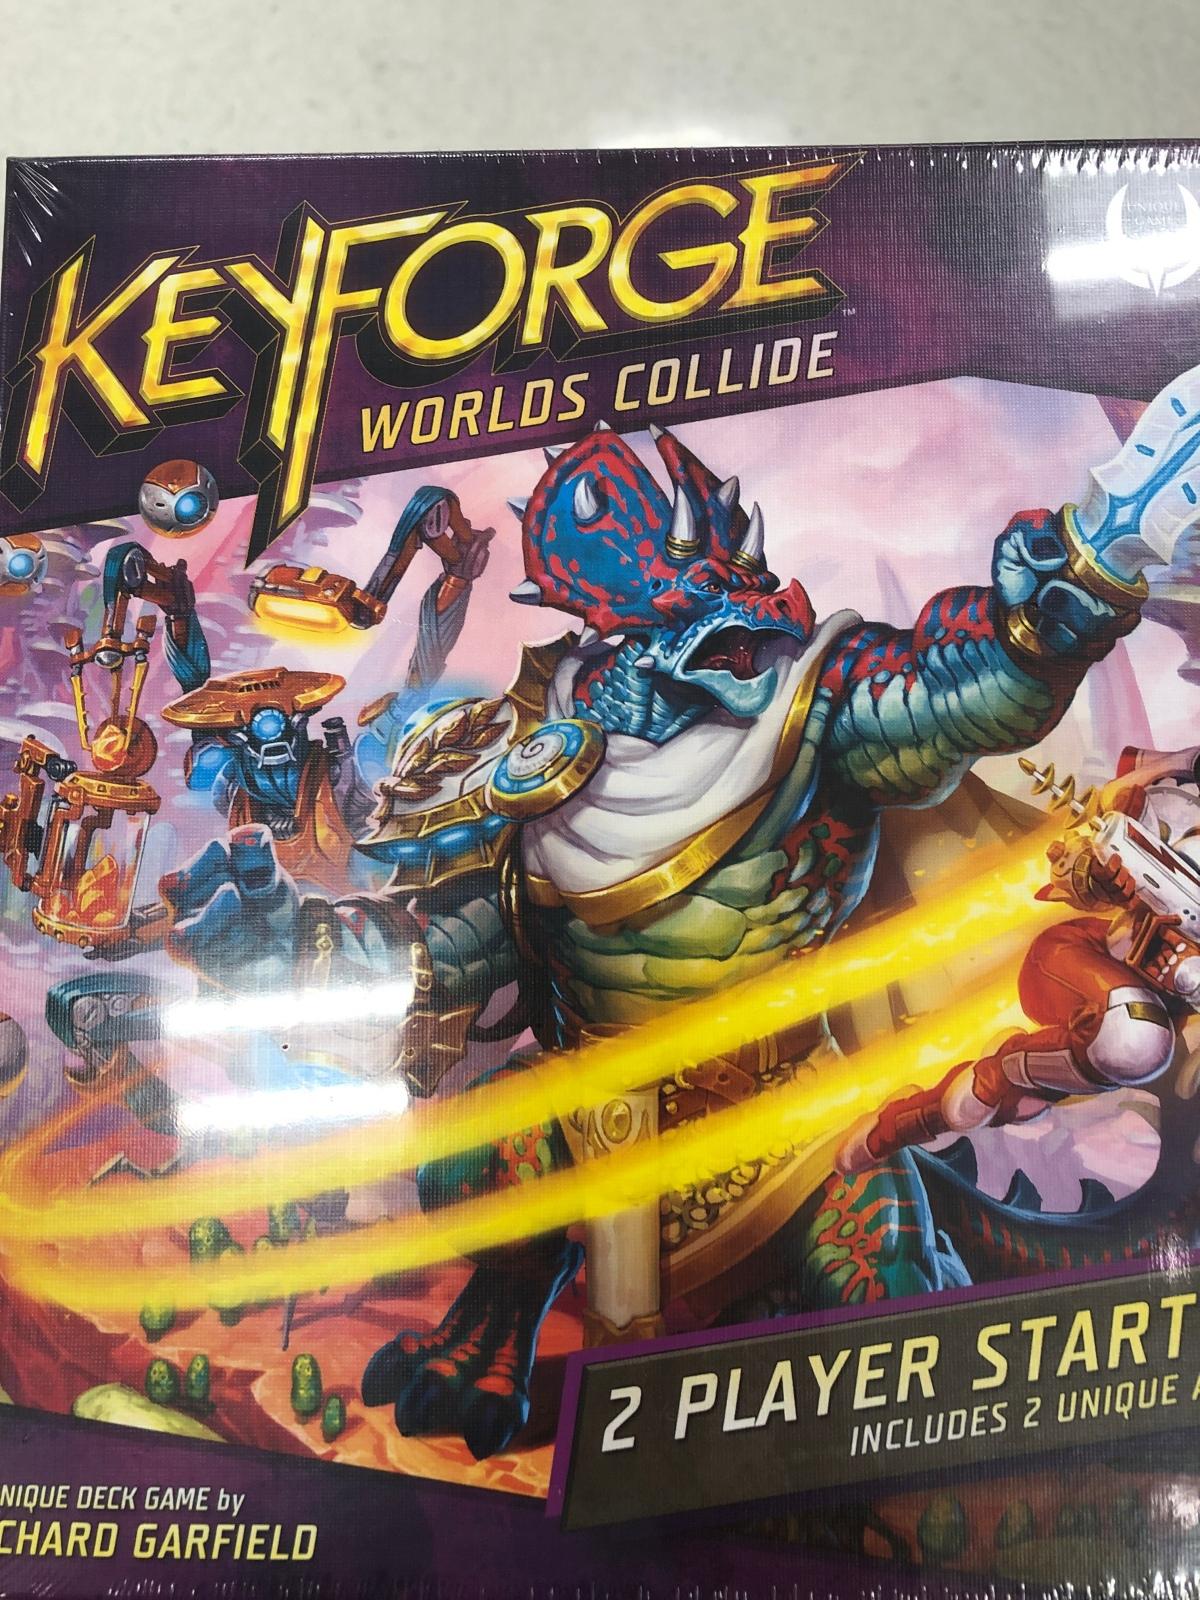 Keyforge is BANANAS!